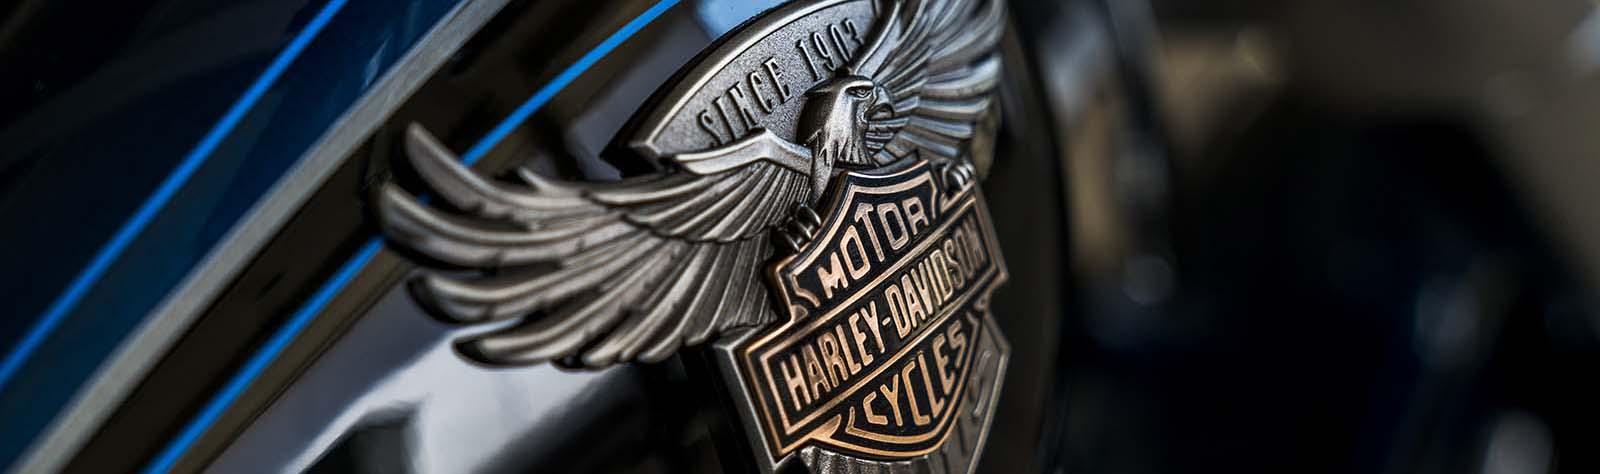 About Stutsman Harley-Davidson